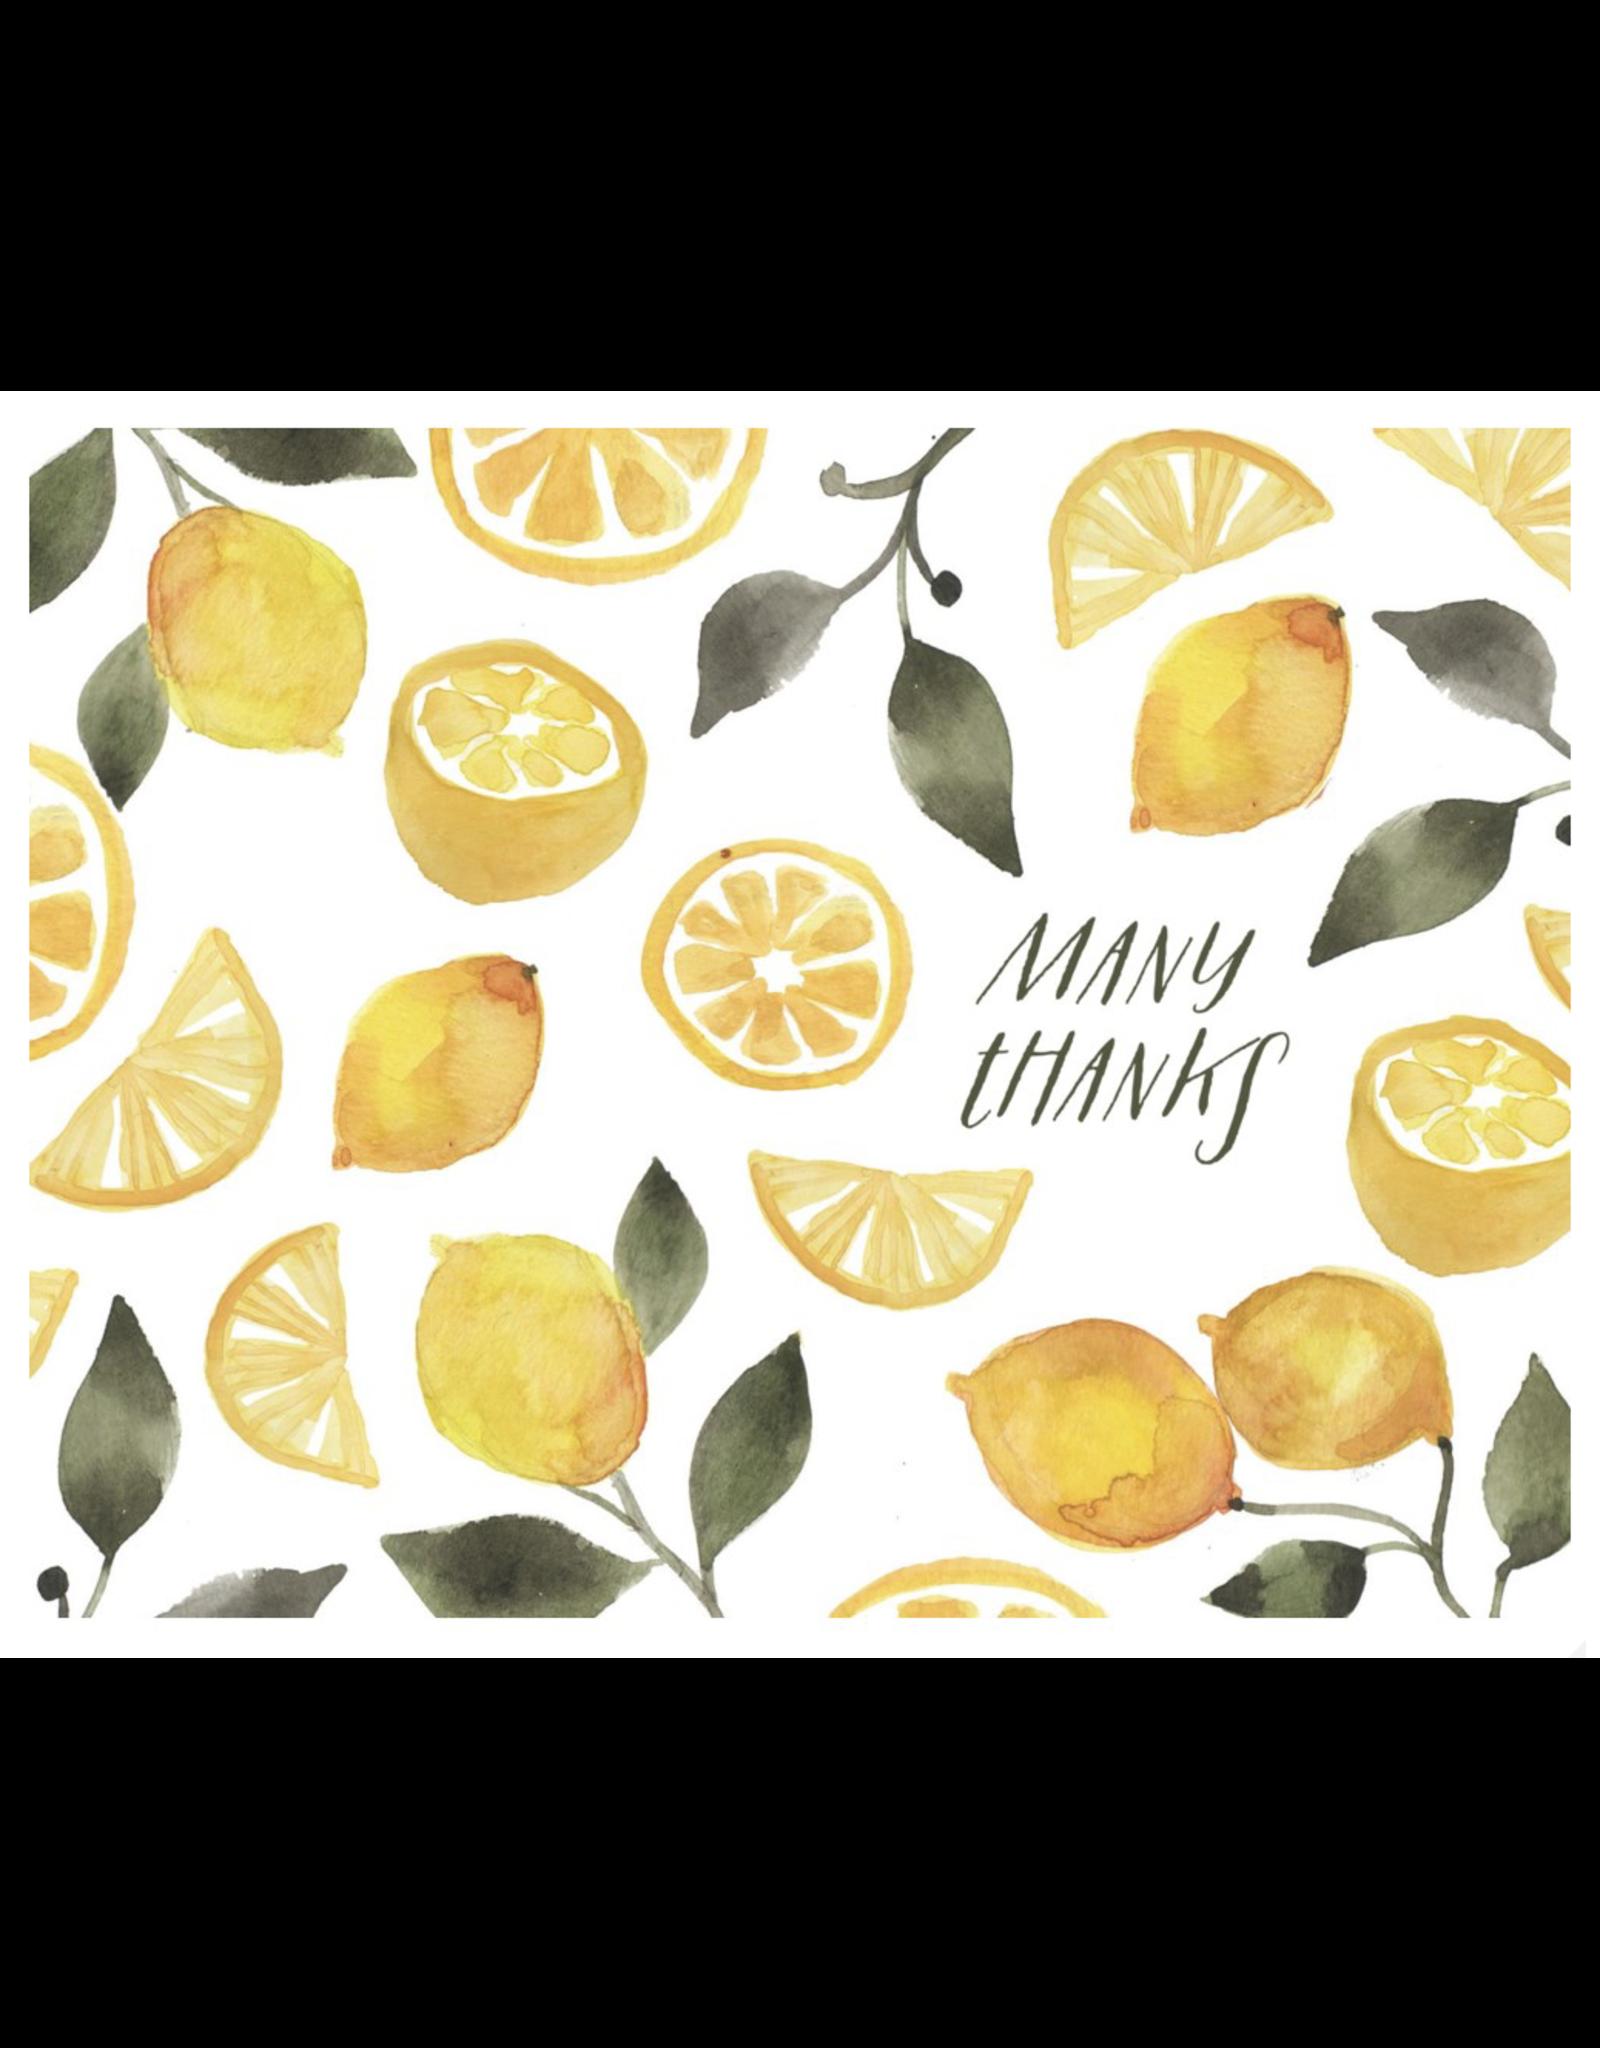 Thank You - Many Thanks Lemons